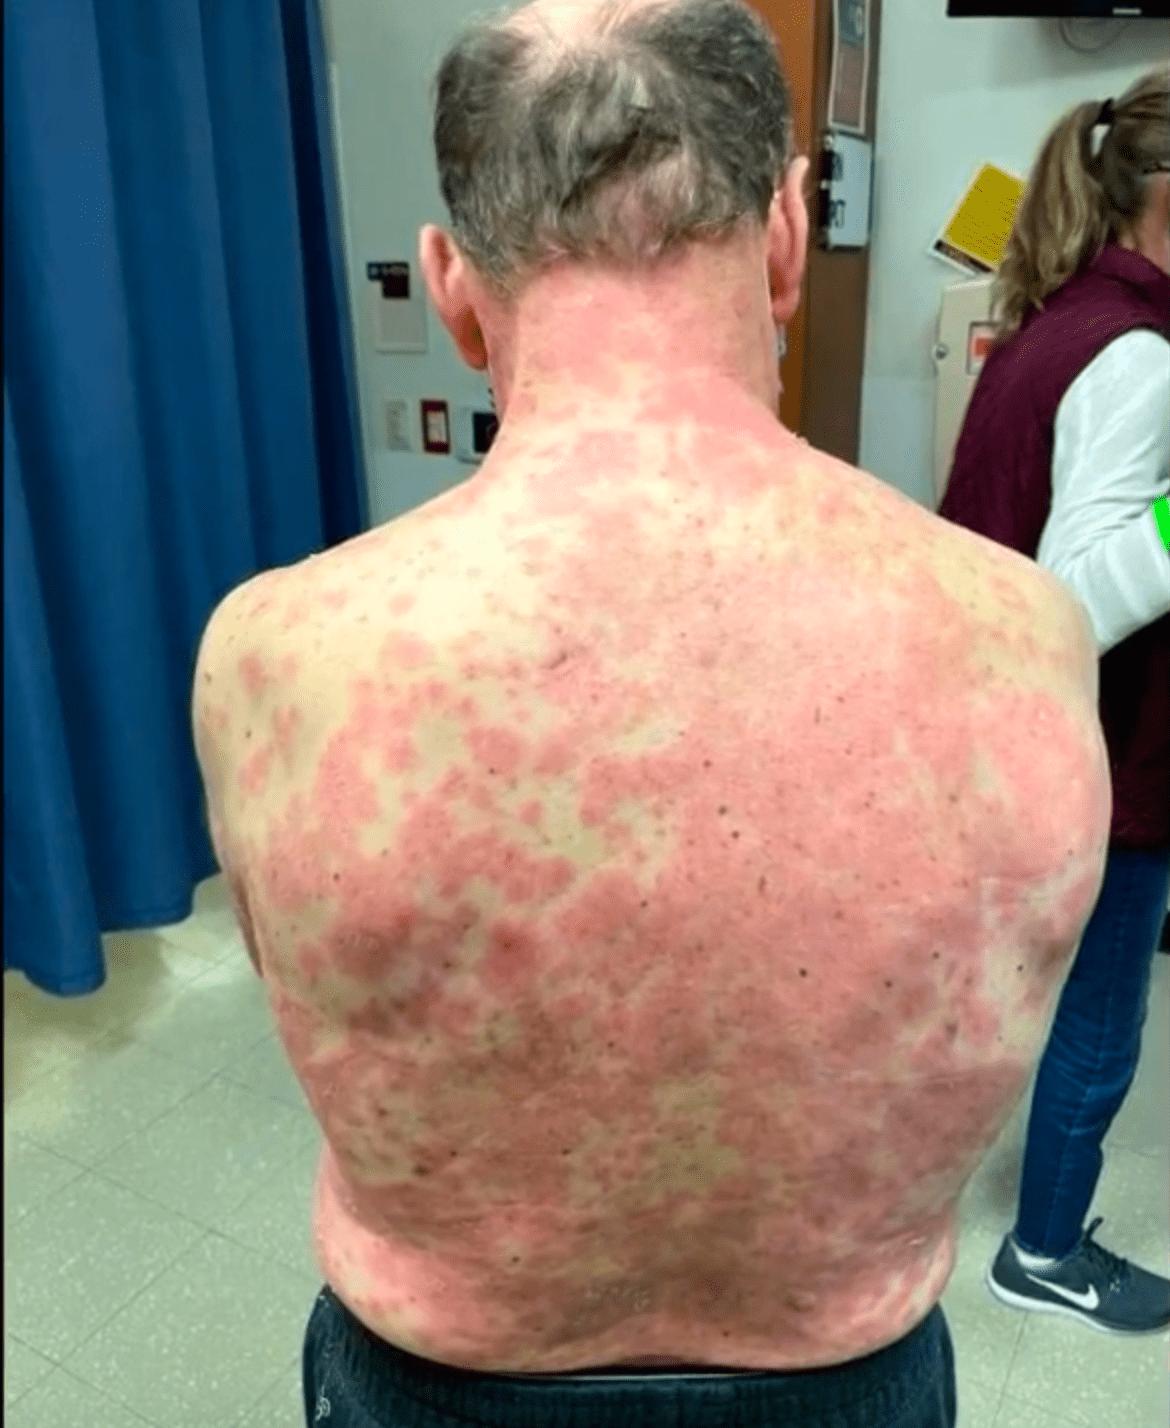 Richard Terrell: 74-year-old Virginia man gets full-body swelling, severe rash after Johnson & Johnson shot